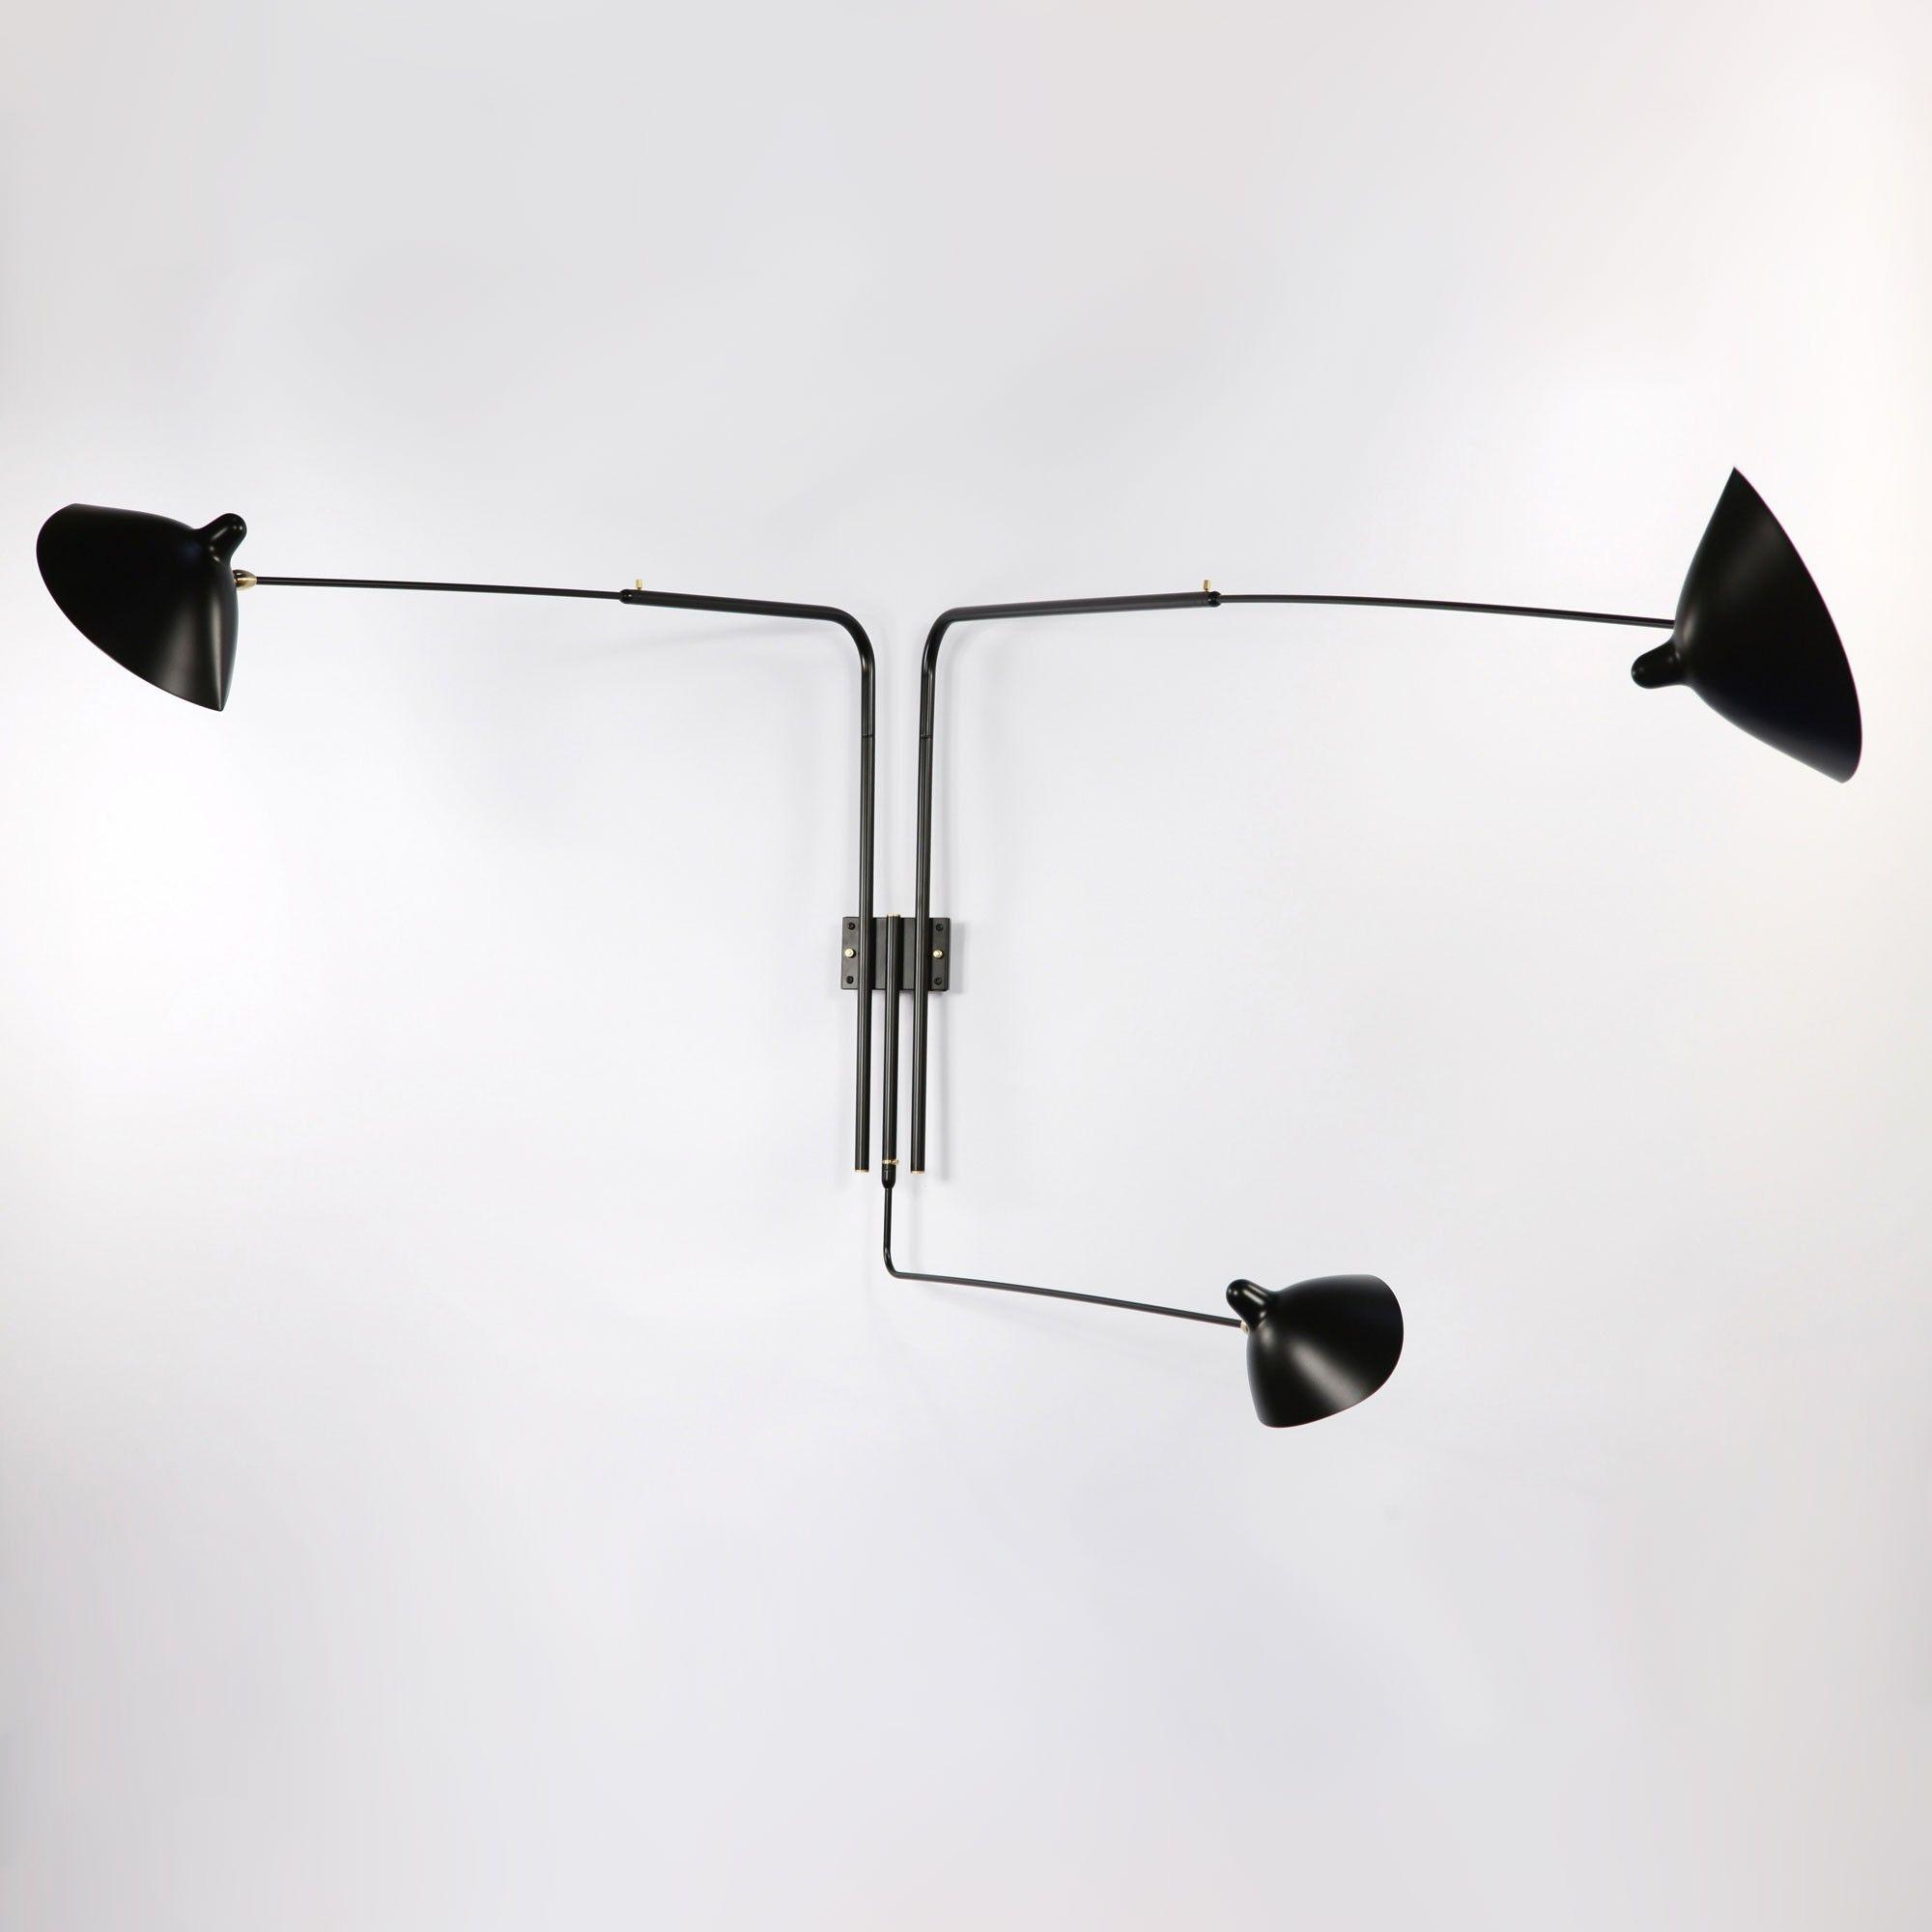 Hangelampe Aus Rattan Moebel Suchmaschine Ladendirekt De Lampe Hange Lampe Rattan Lampe